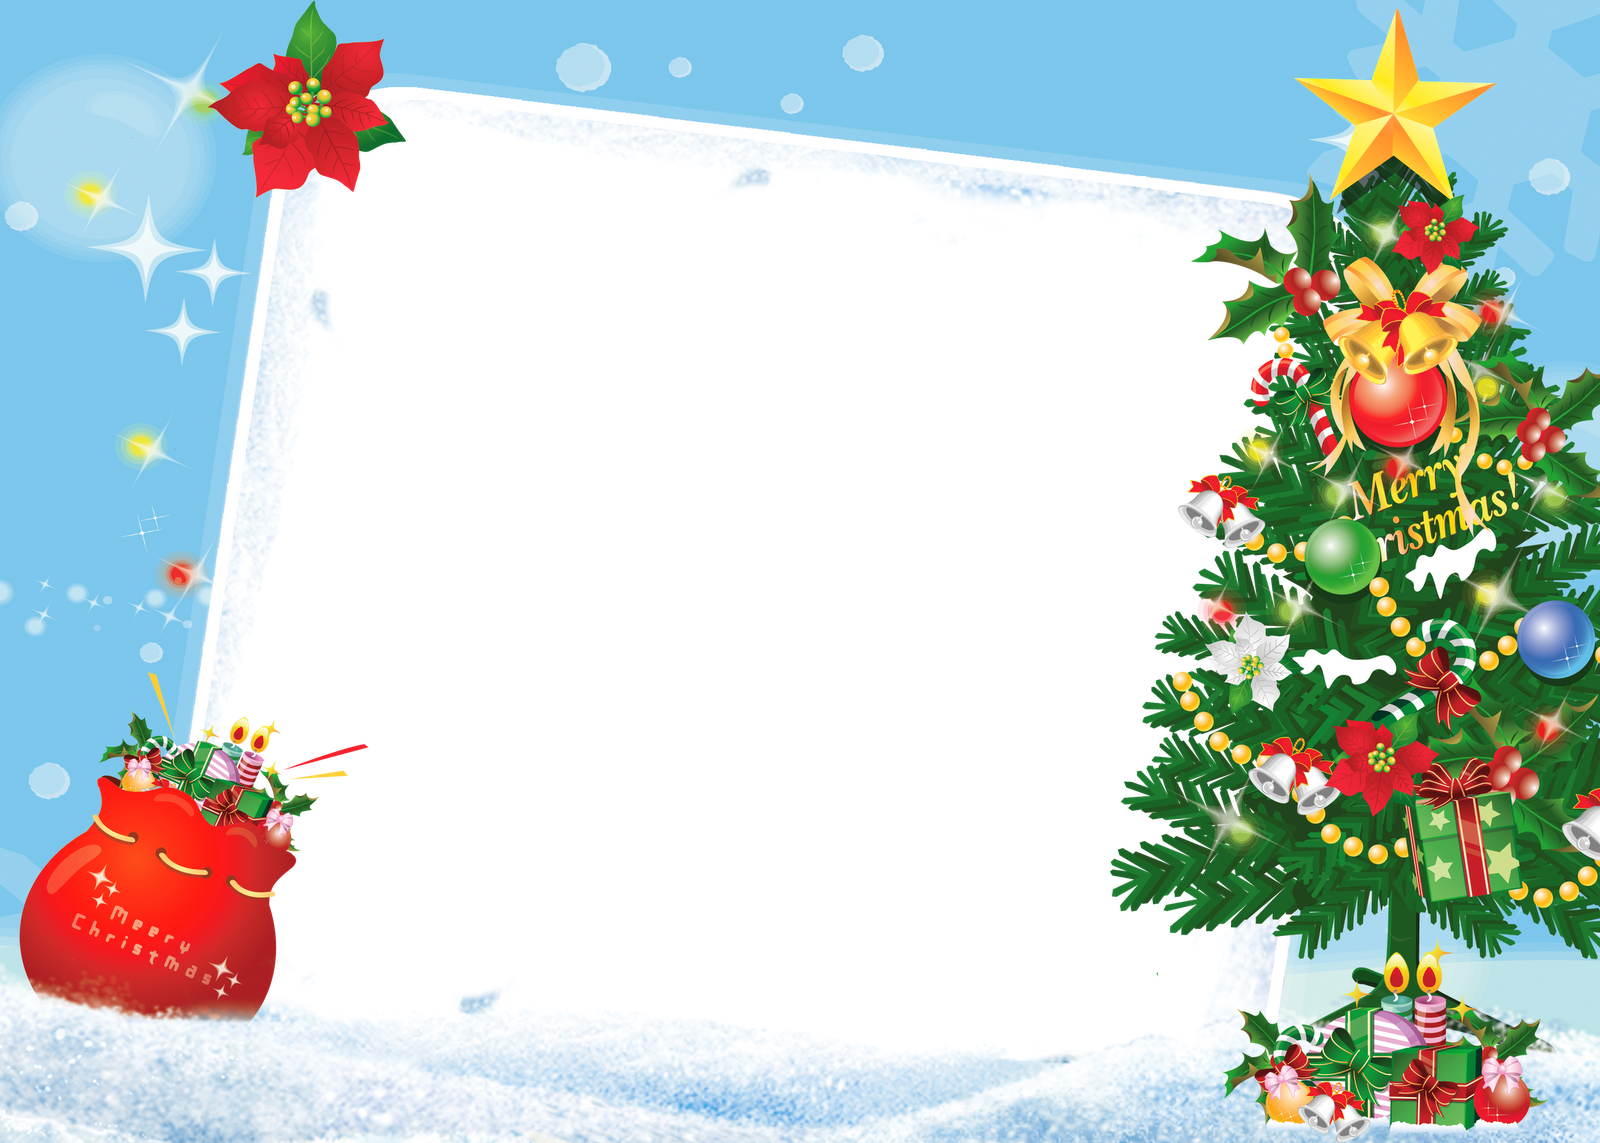 Merry Christmas PNG Frame with Christmas Tree.